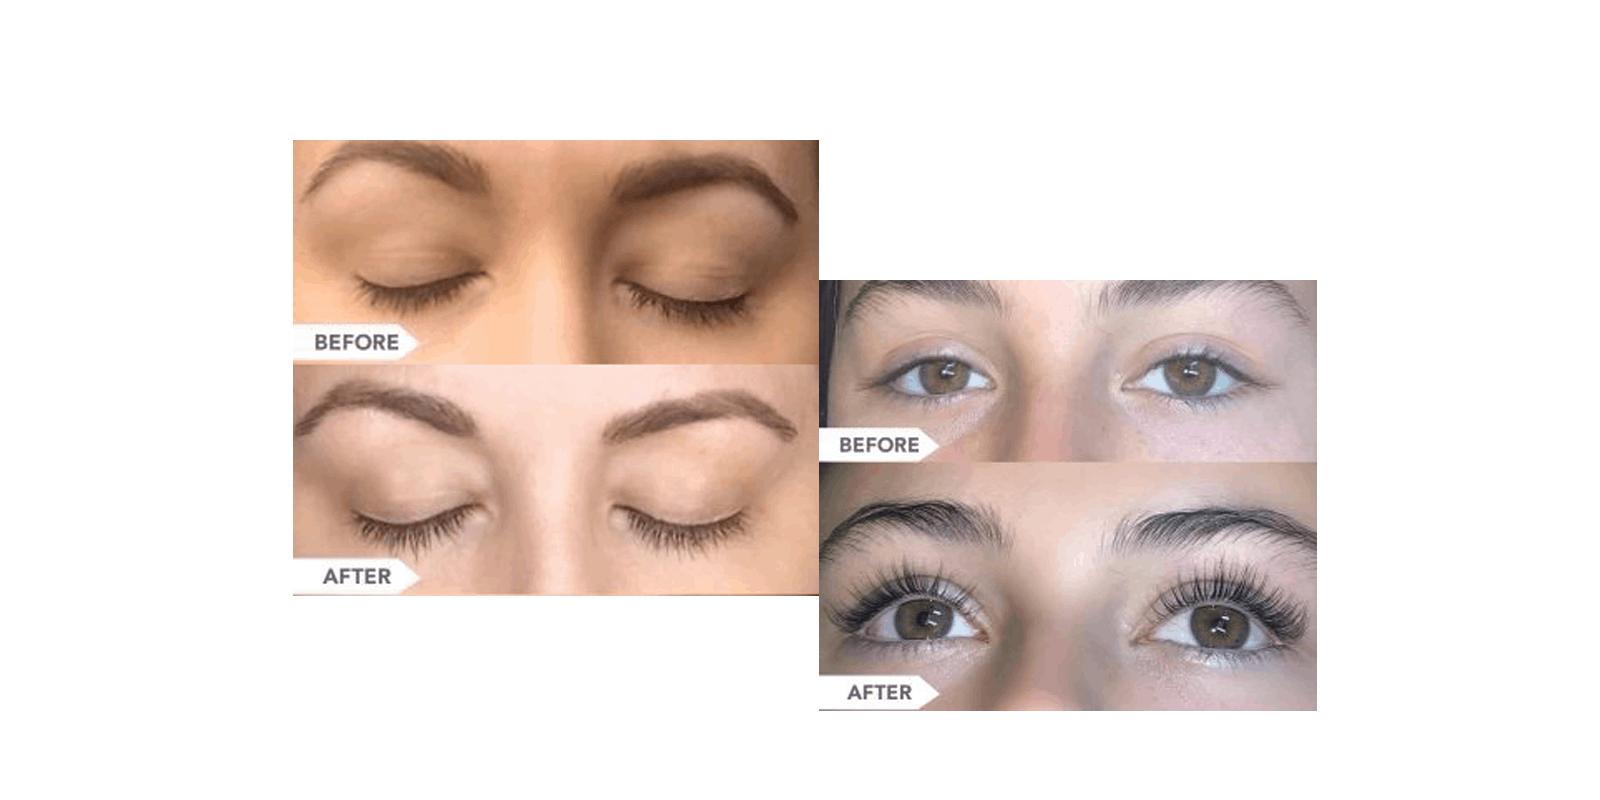 Bioluma Eyelash Serum before and after